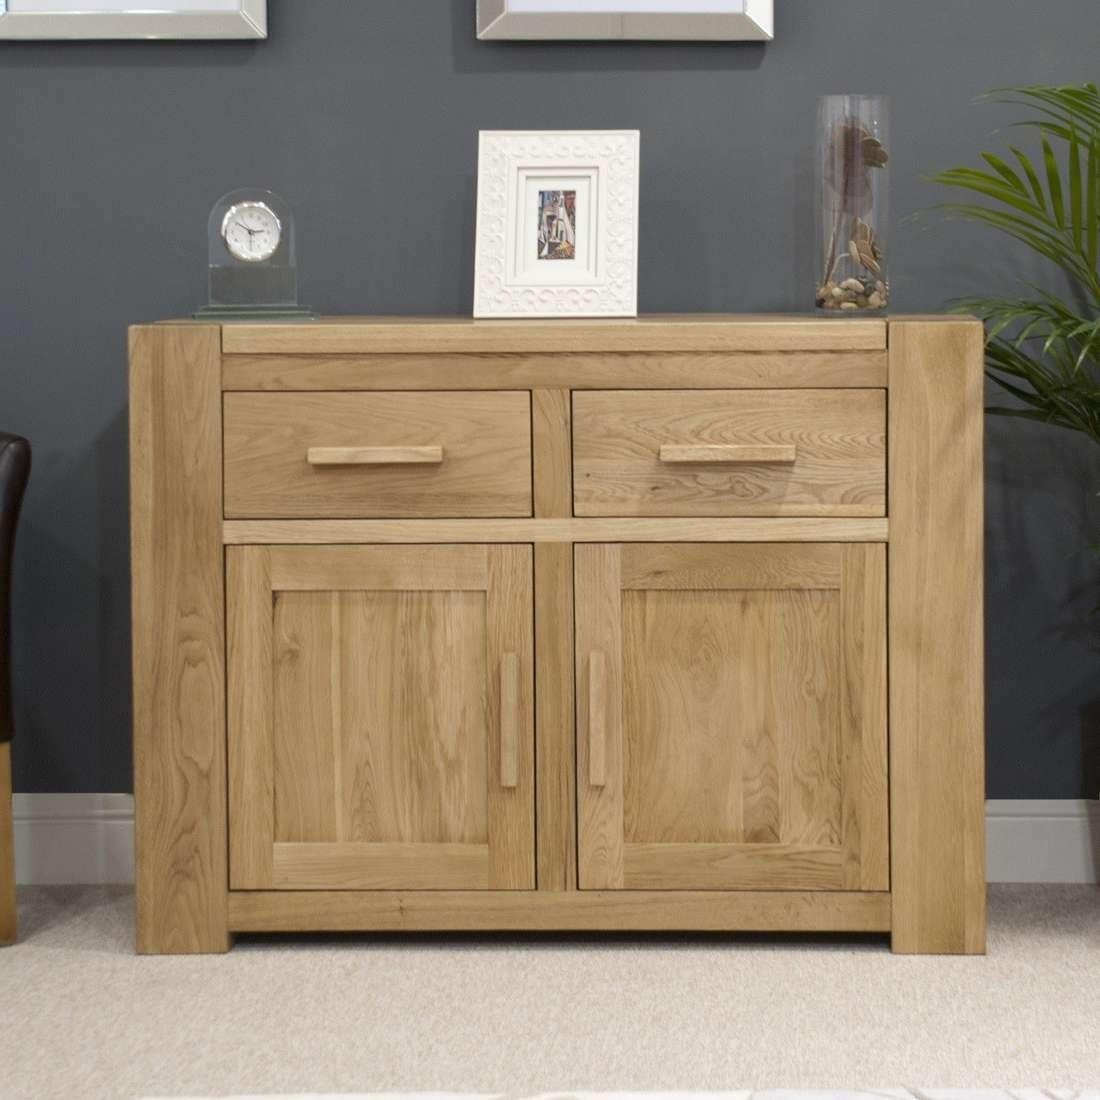 Trend Solid Oak Small 2 Door Sideboard | Oak Furniture Uk Pertaining To Oak Sideboards (View 12 of 20)